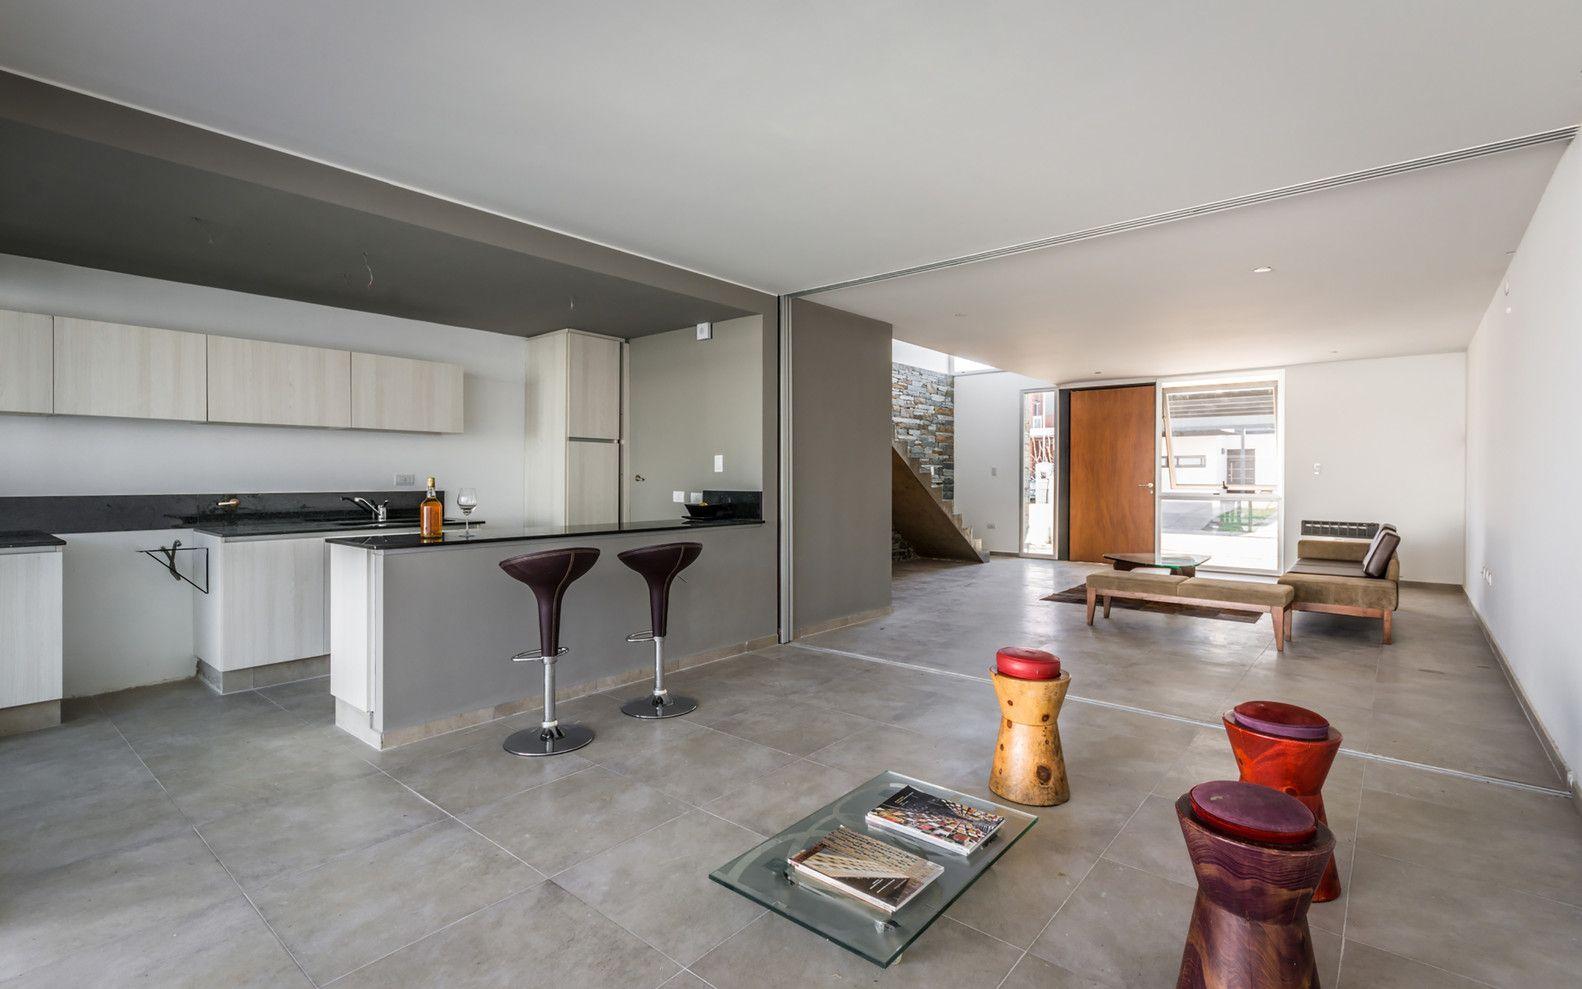 Galería Casas Adosadas Estudio A 3 8 Salas Living Room Living Room Designs House